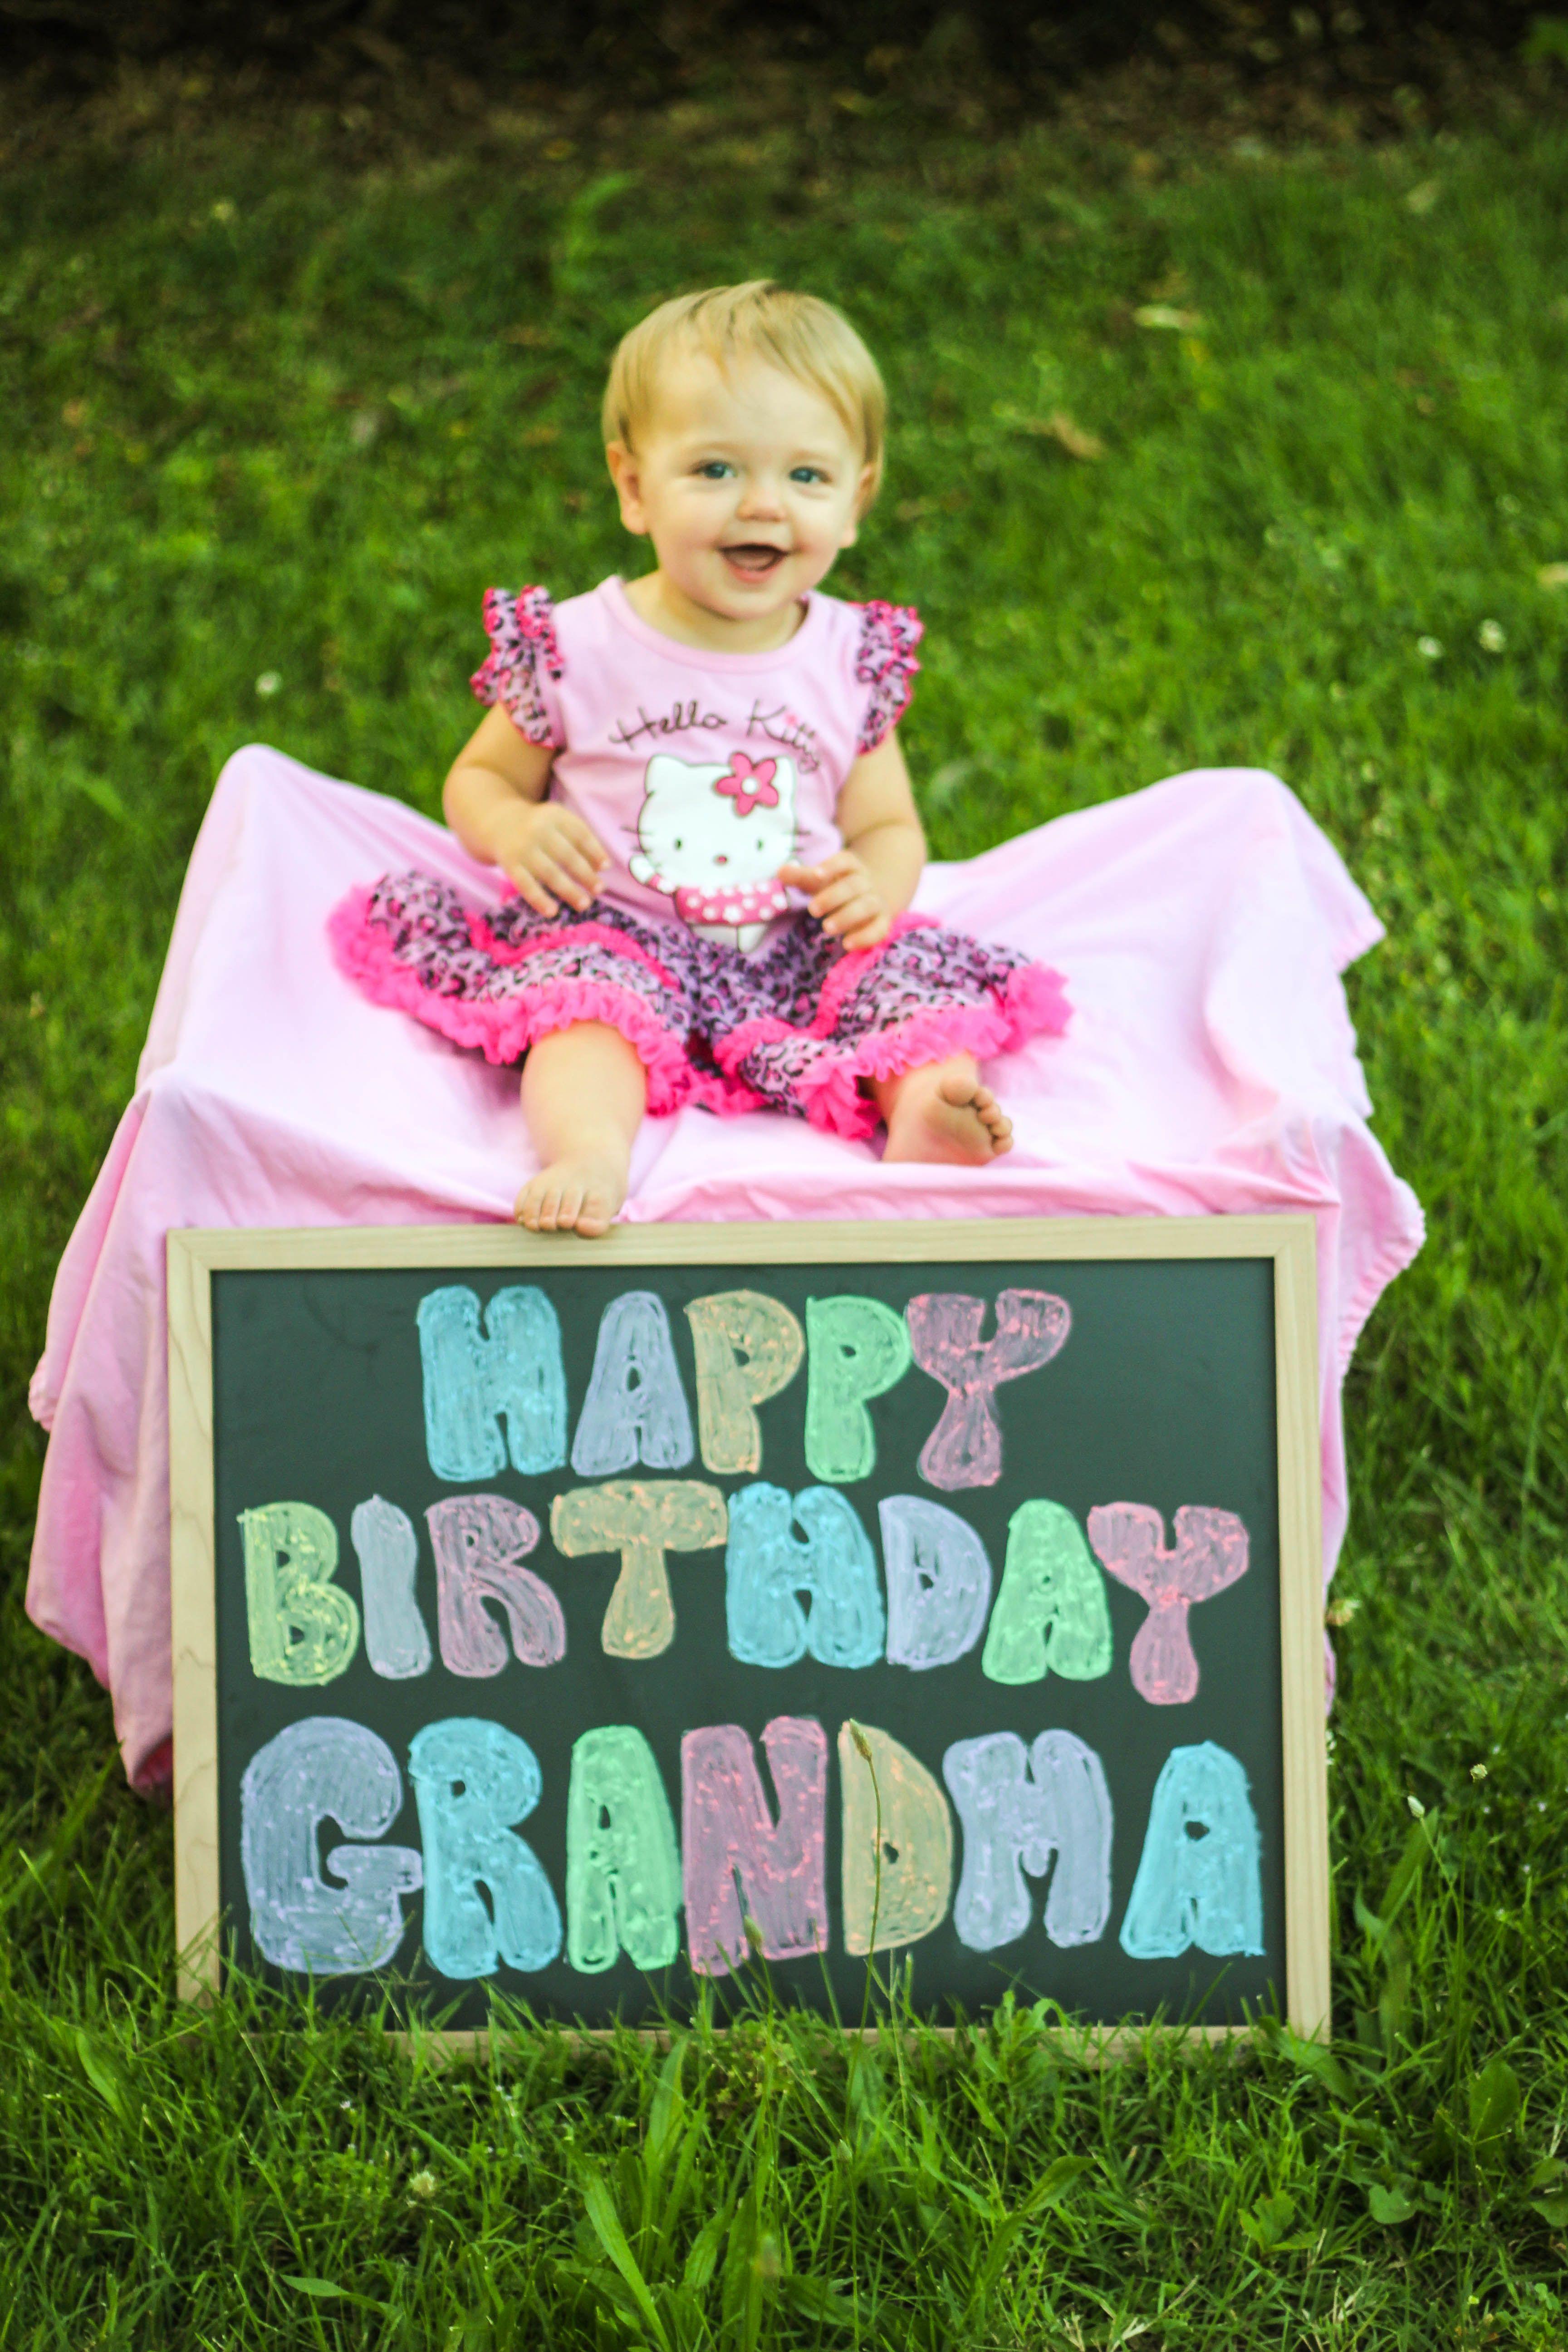 Khloe's Birthday present to grandma Homeschool preschool